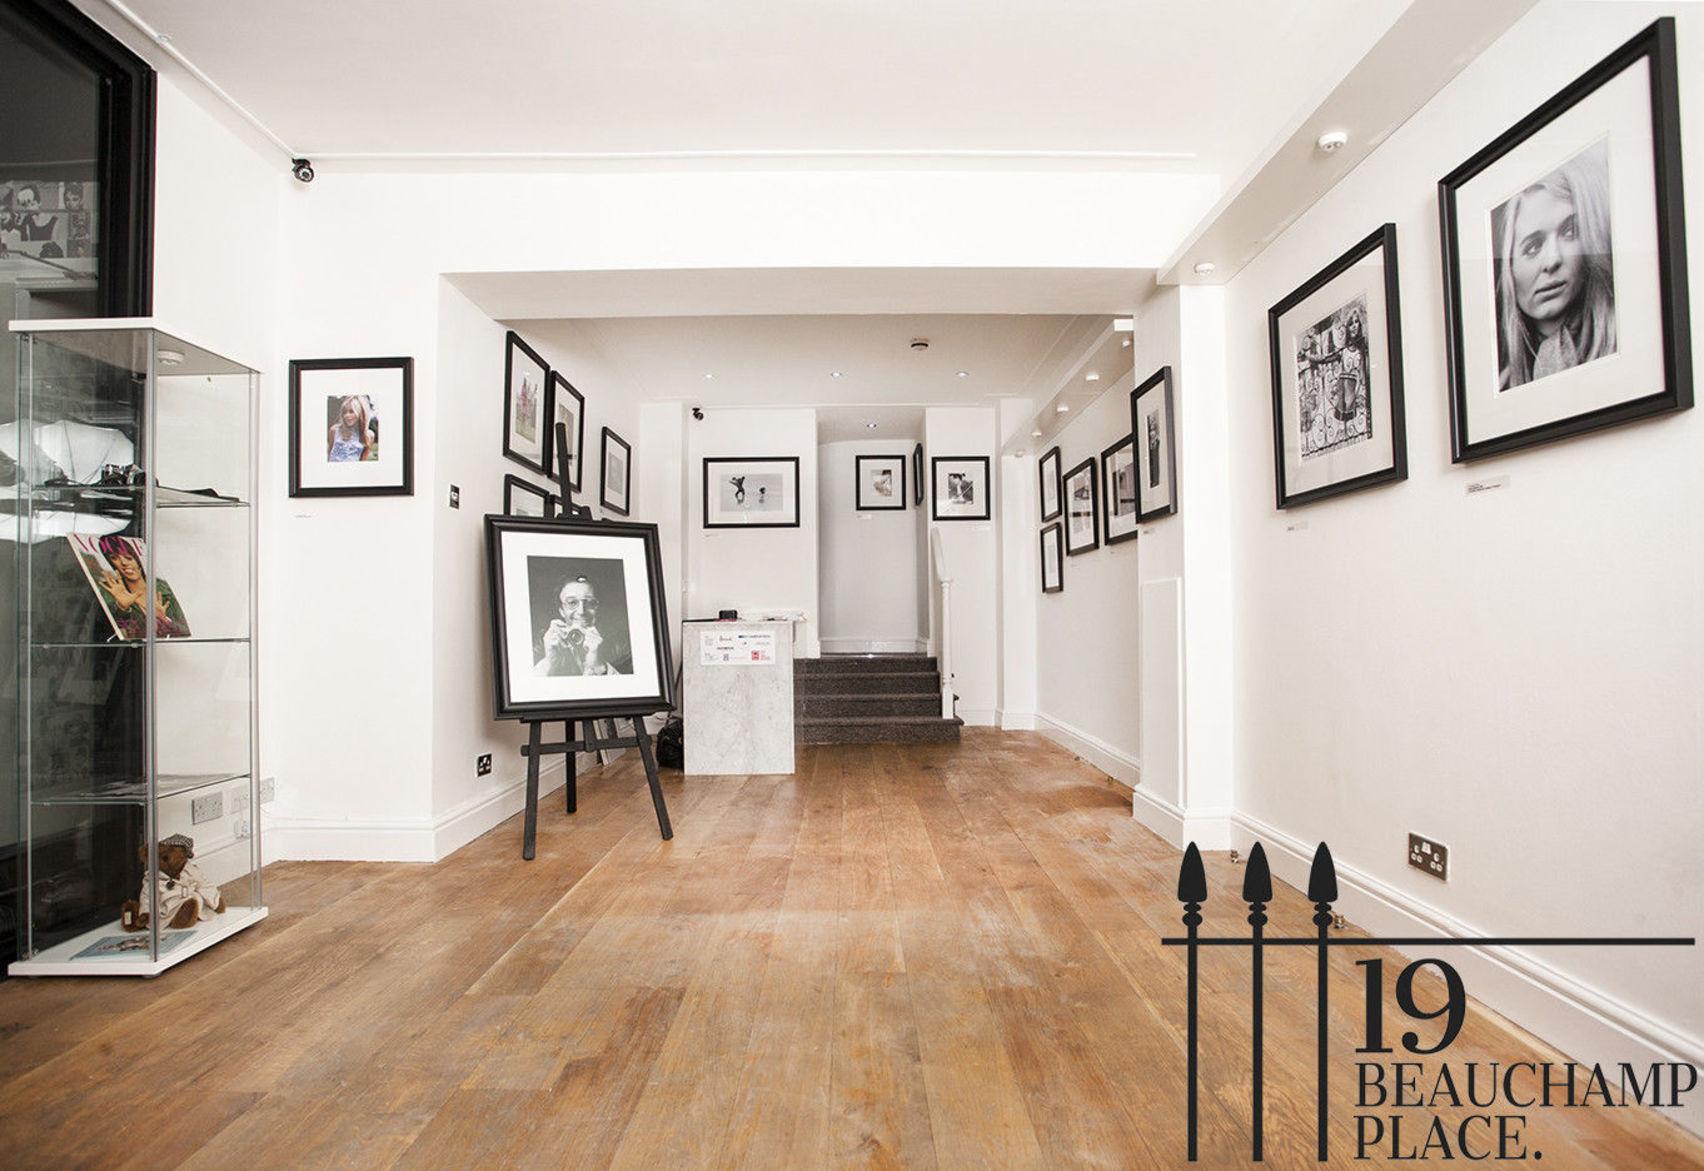 1st Floor Townhouse, 19 Beauchamp Place